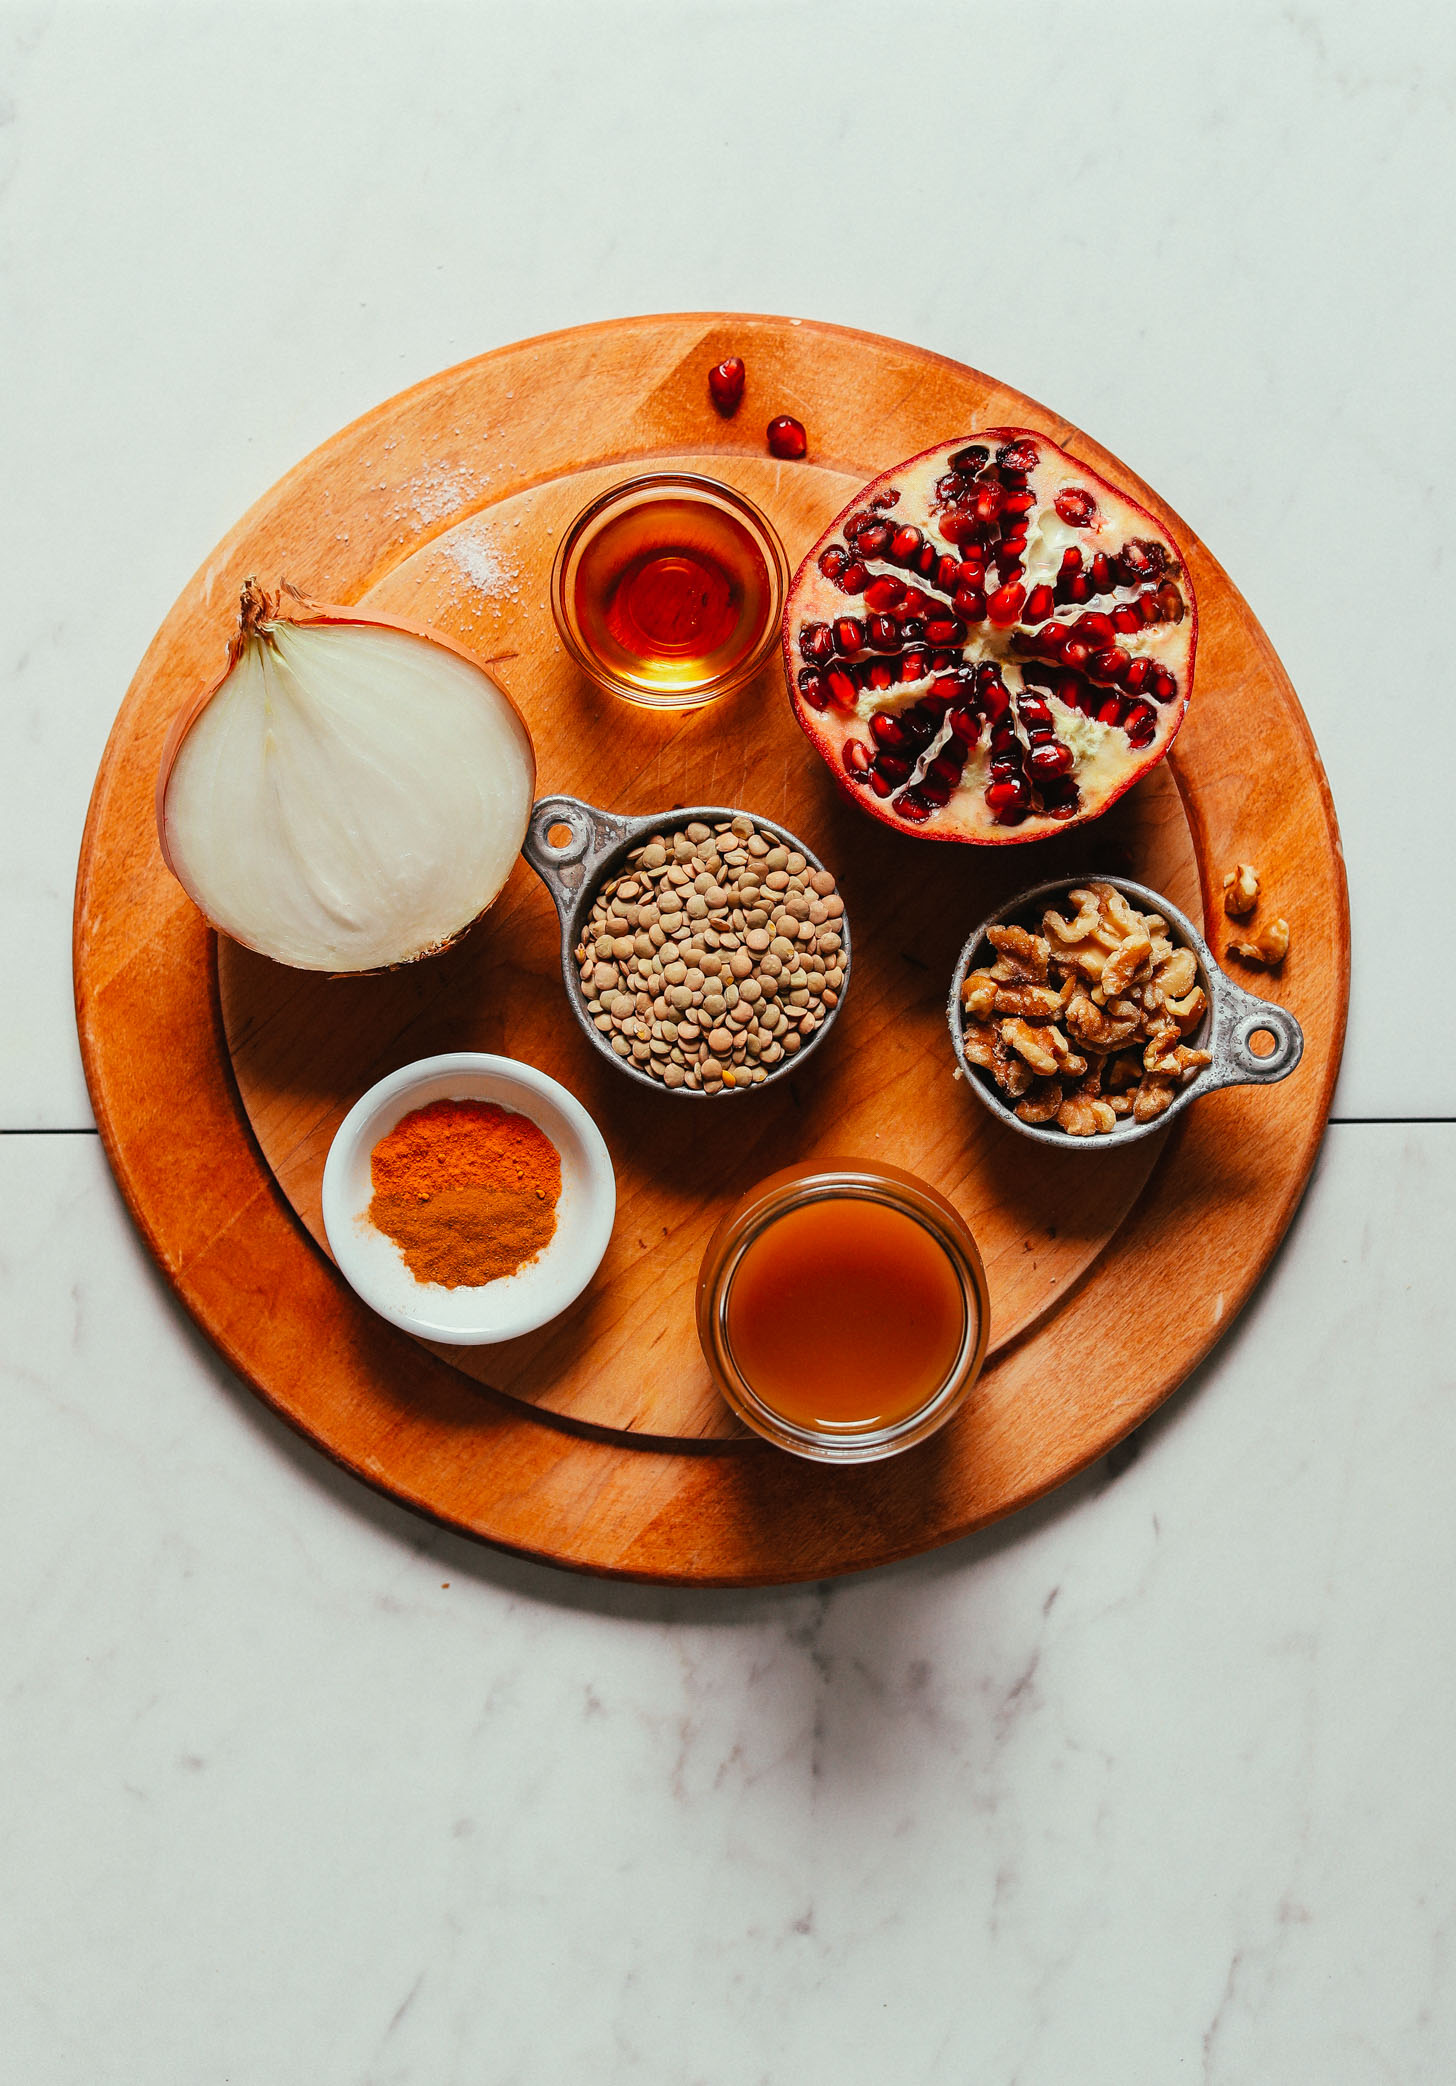 Wood cutting board with ingredients for making satisfying gluten-free vegan Lentil Fesenjan